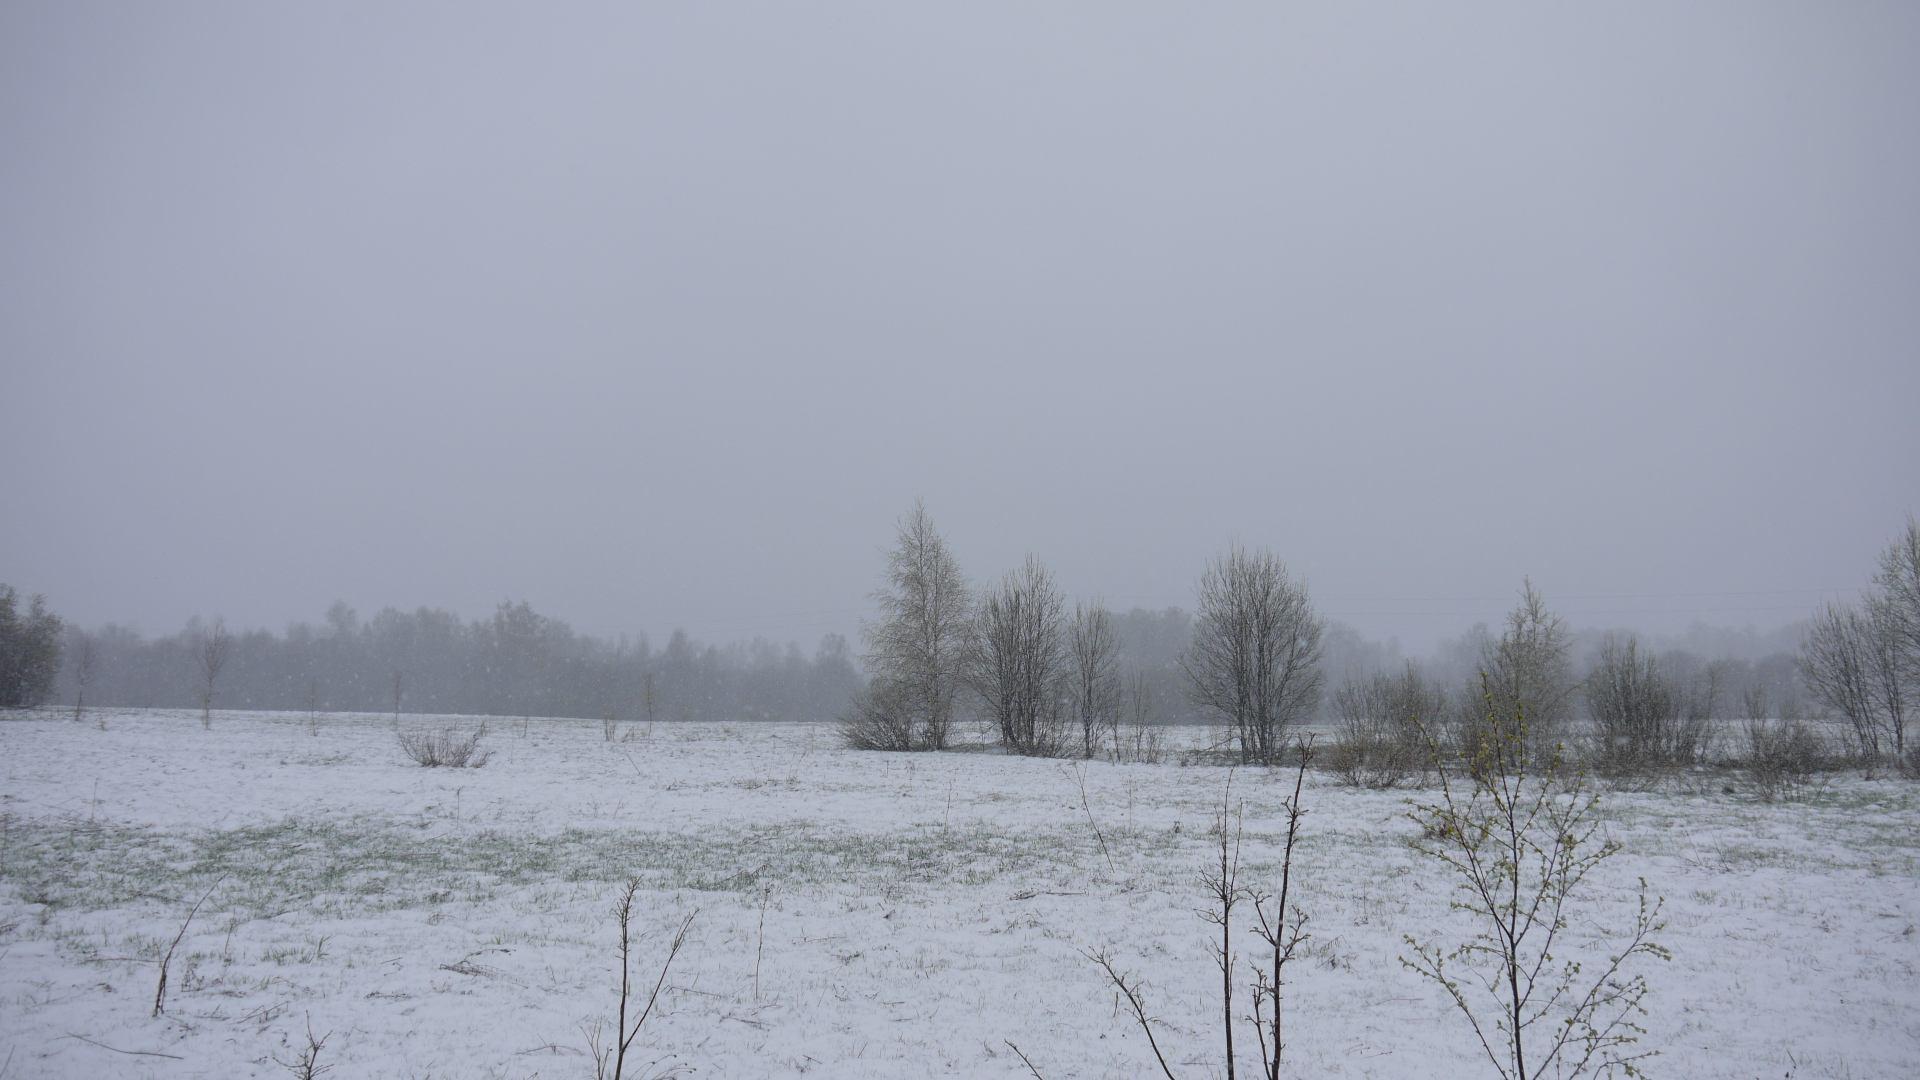 Погода в татарстане на 2 недели